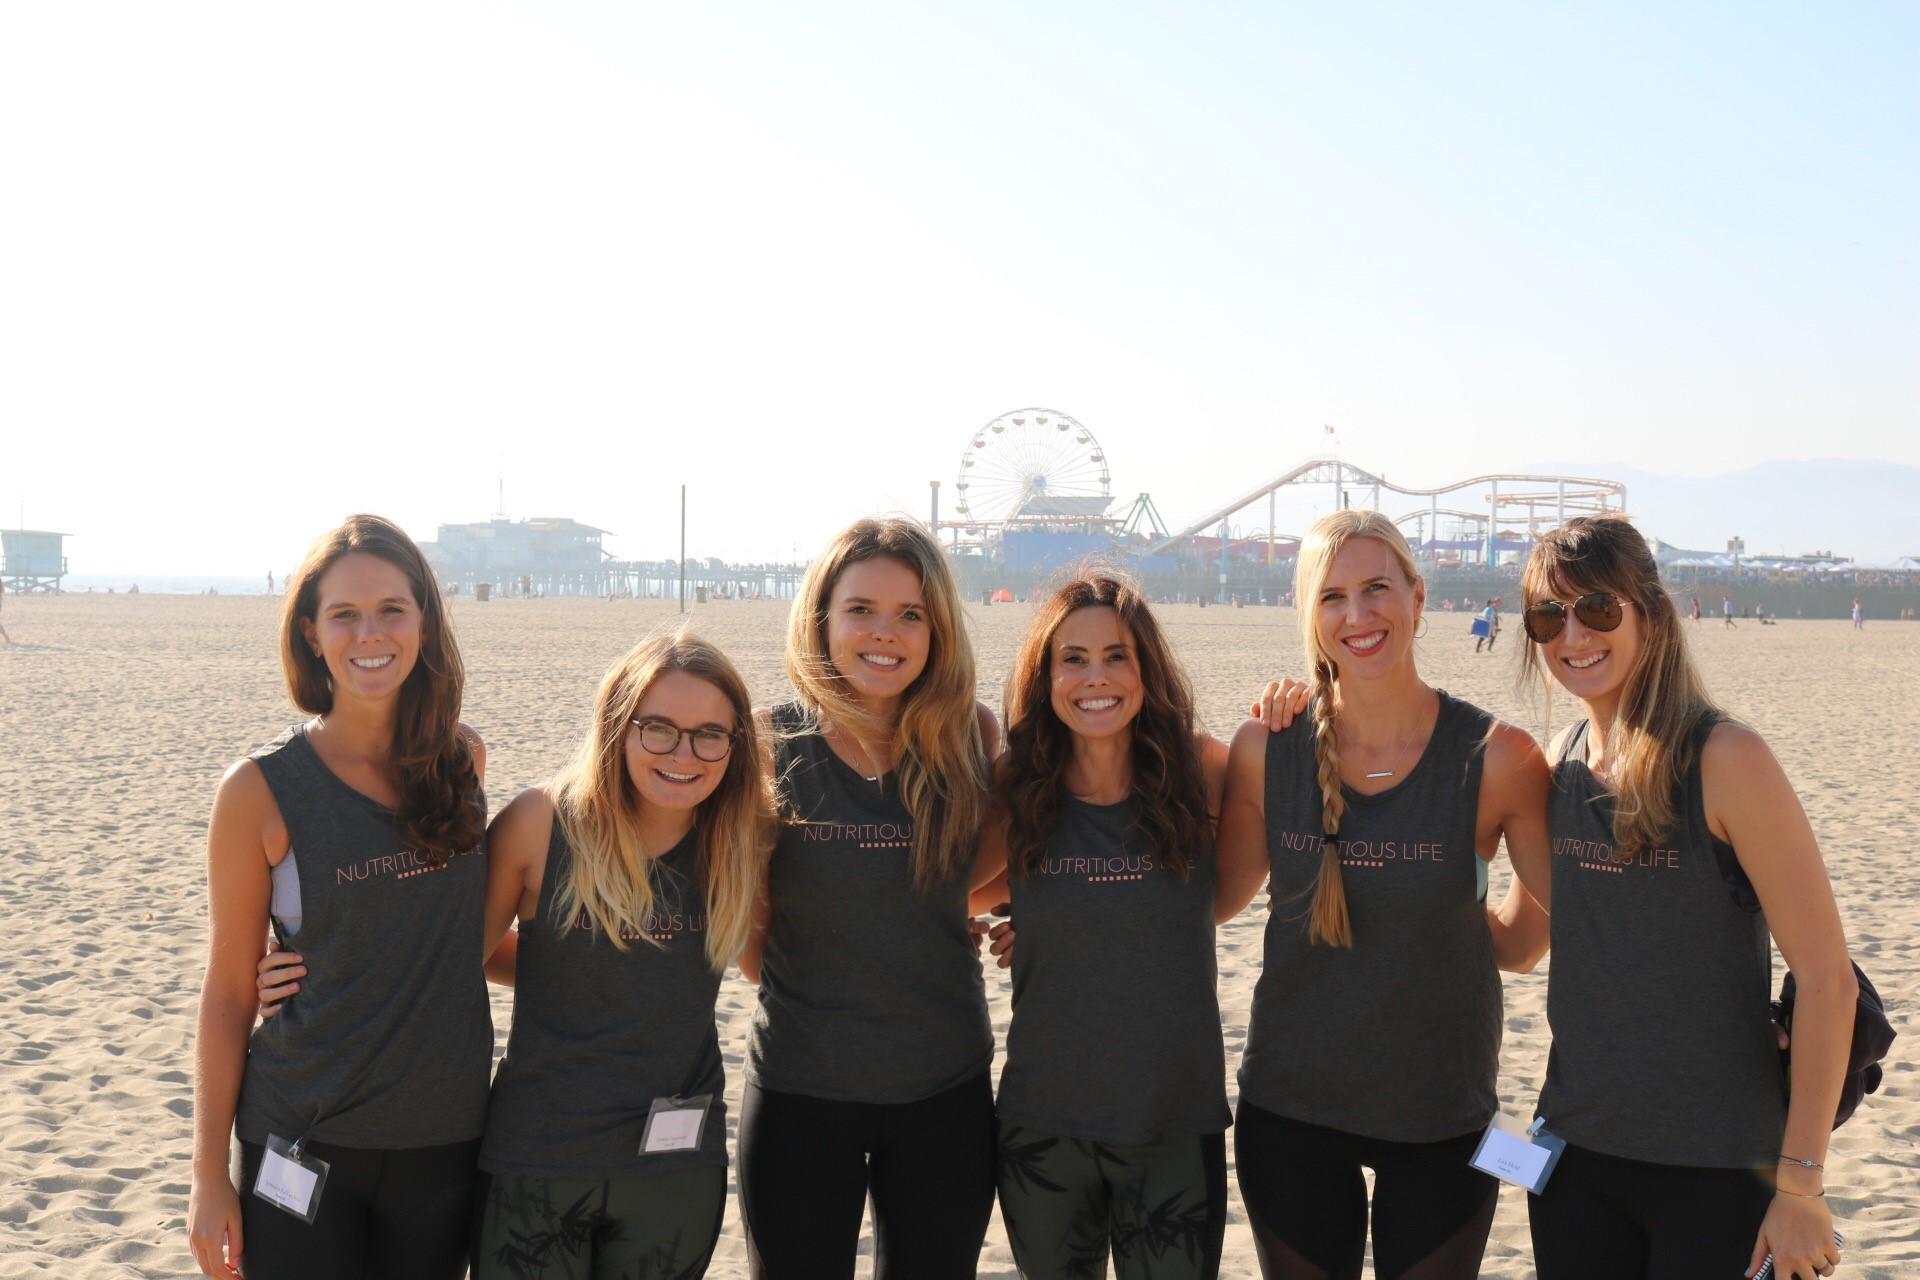 The Nutritious Life Team on the beach in Santa Monica!